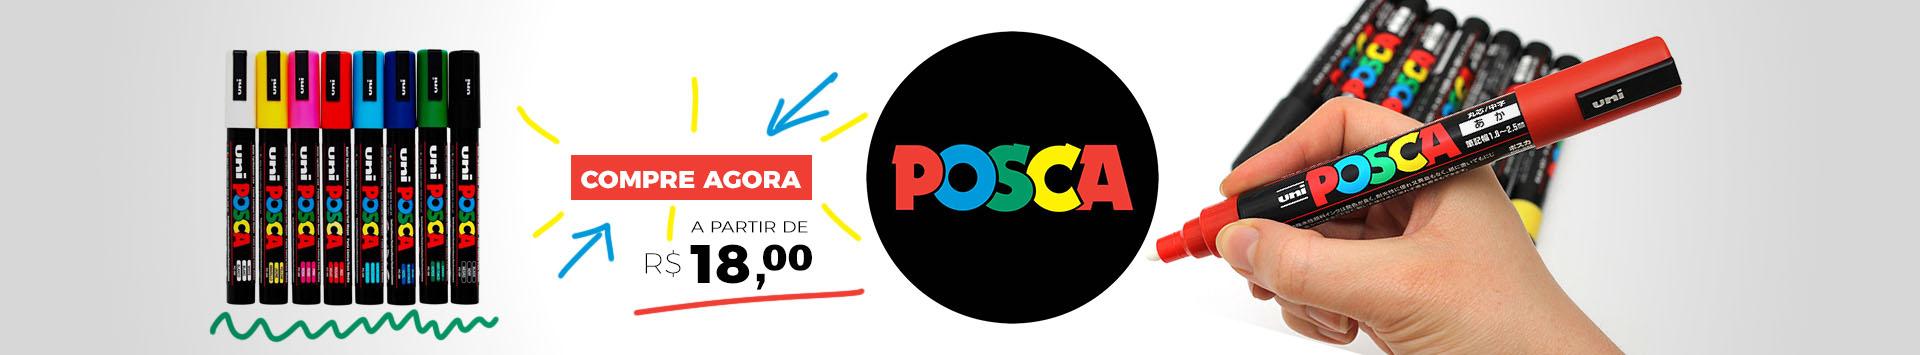 Canetas Posca